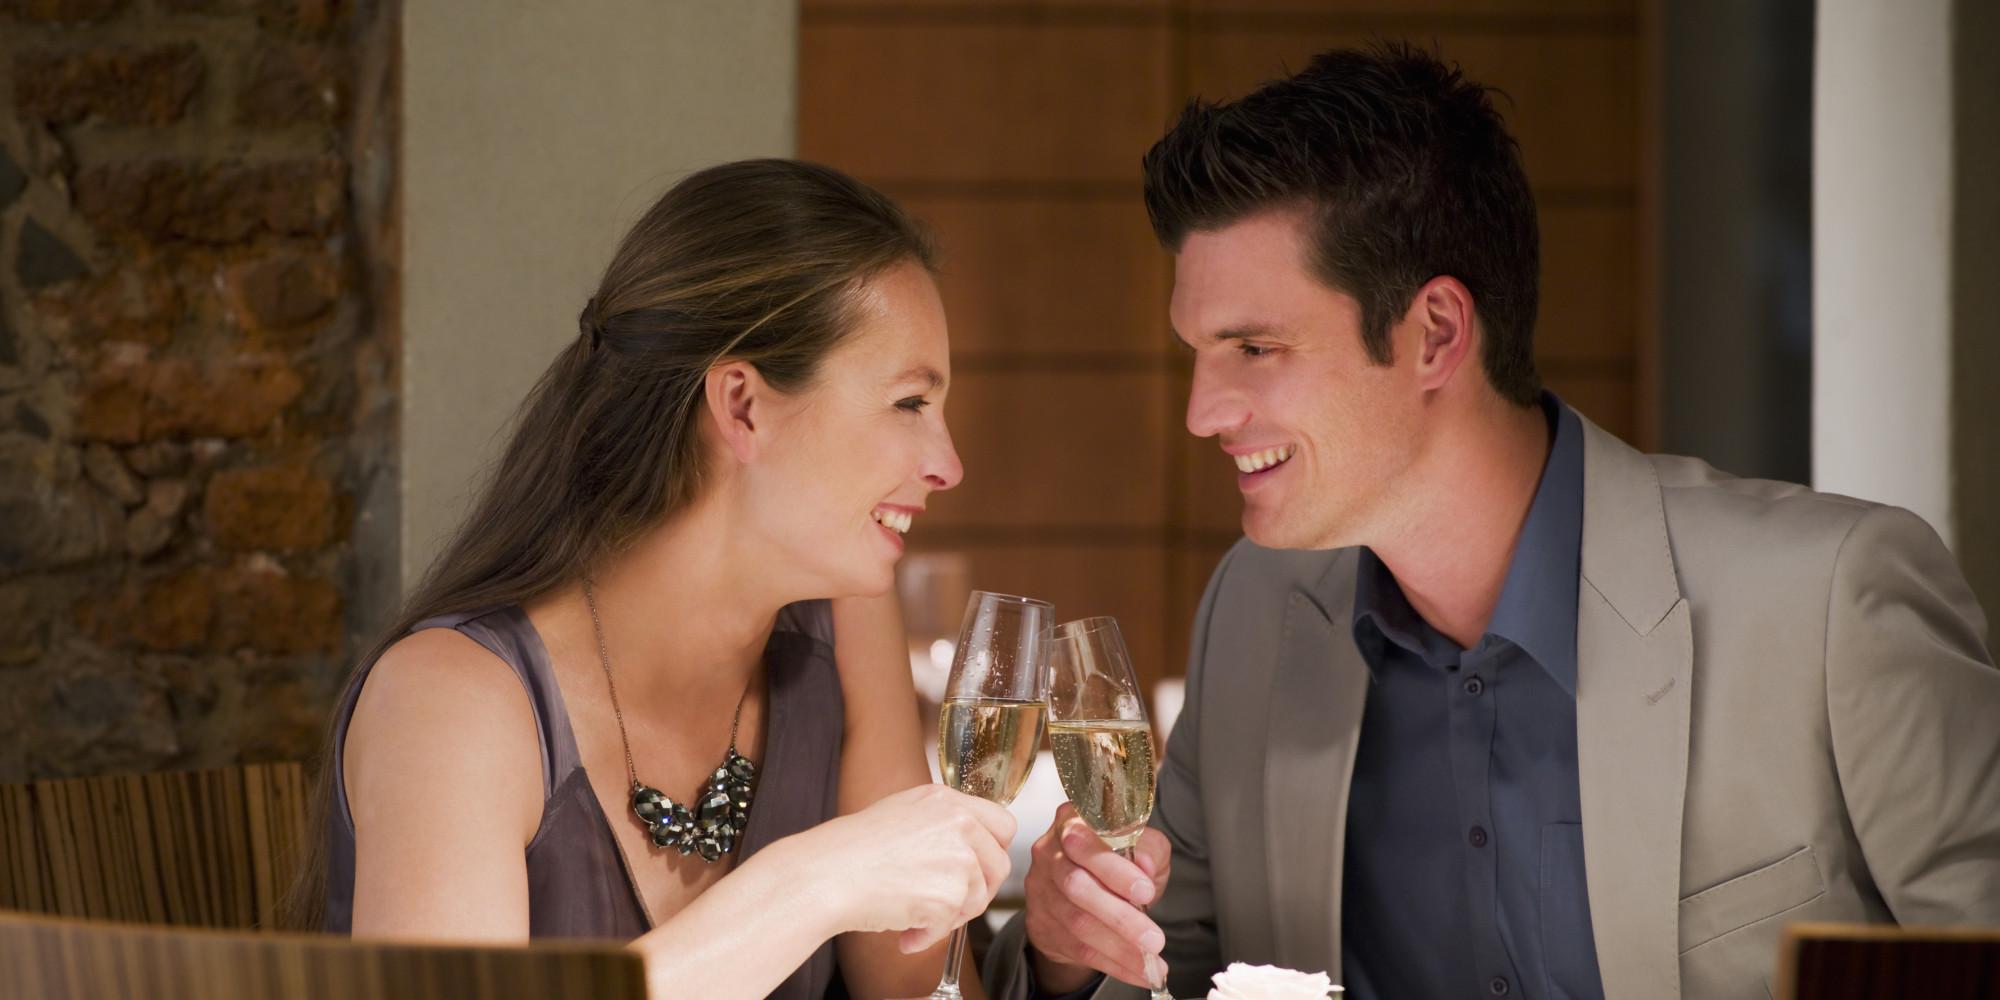 Free dating chat rooms uk bin